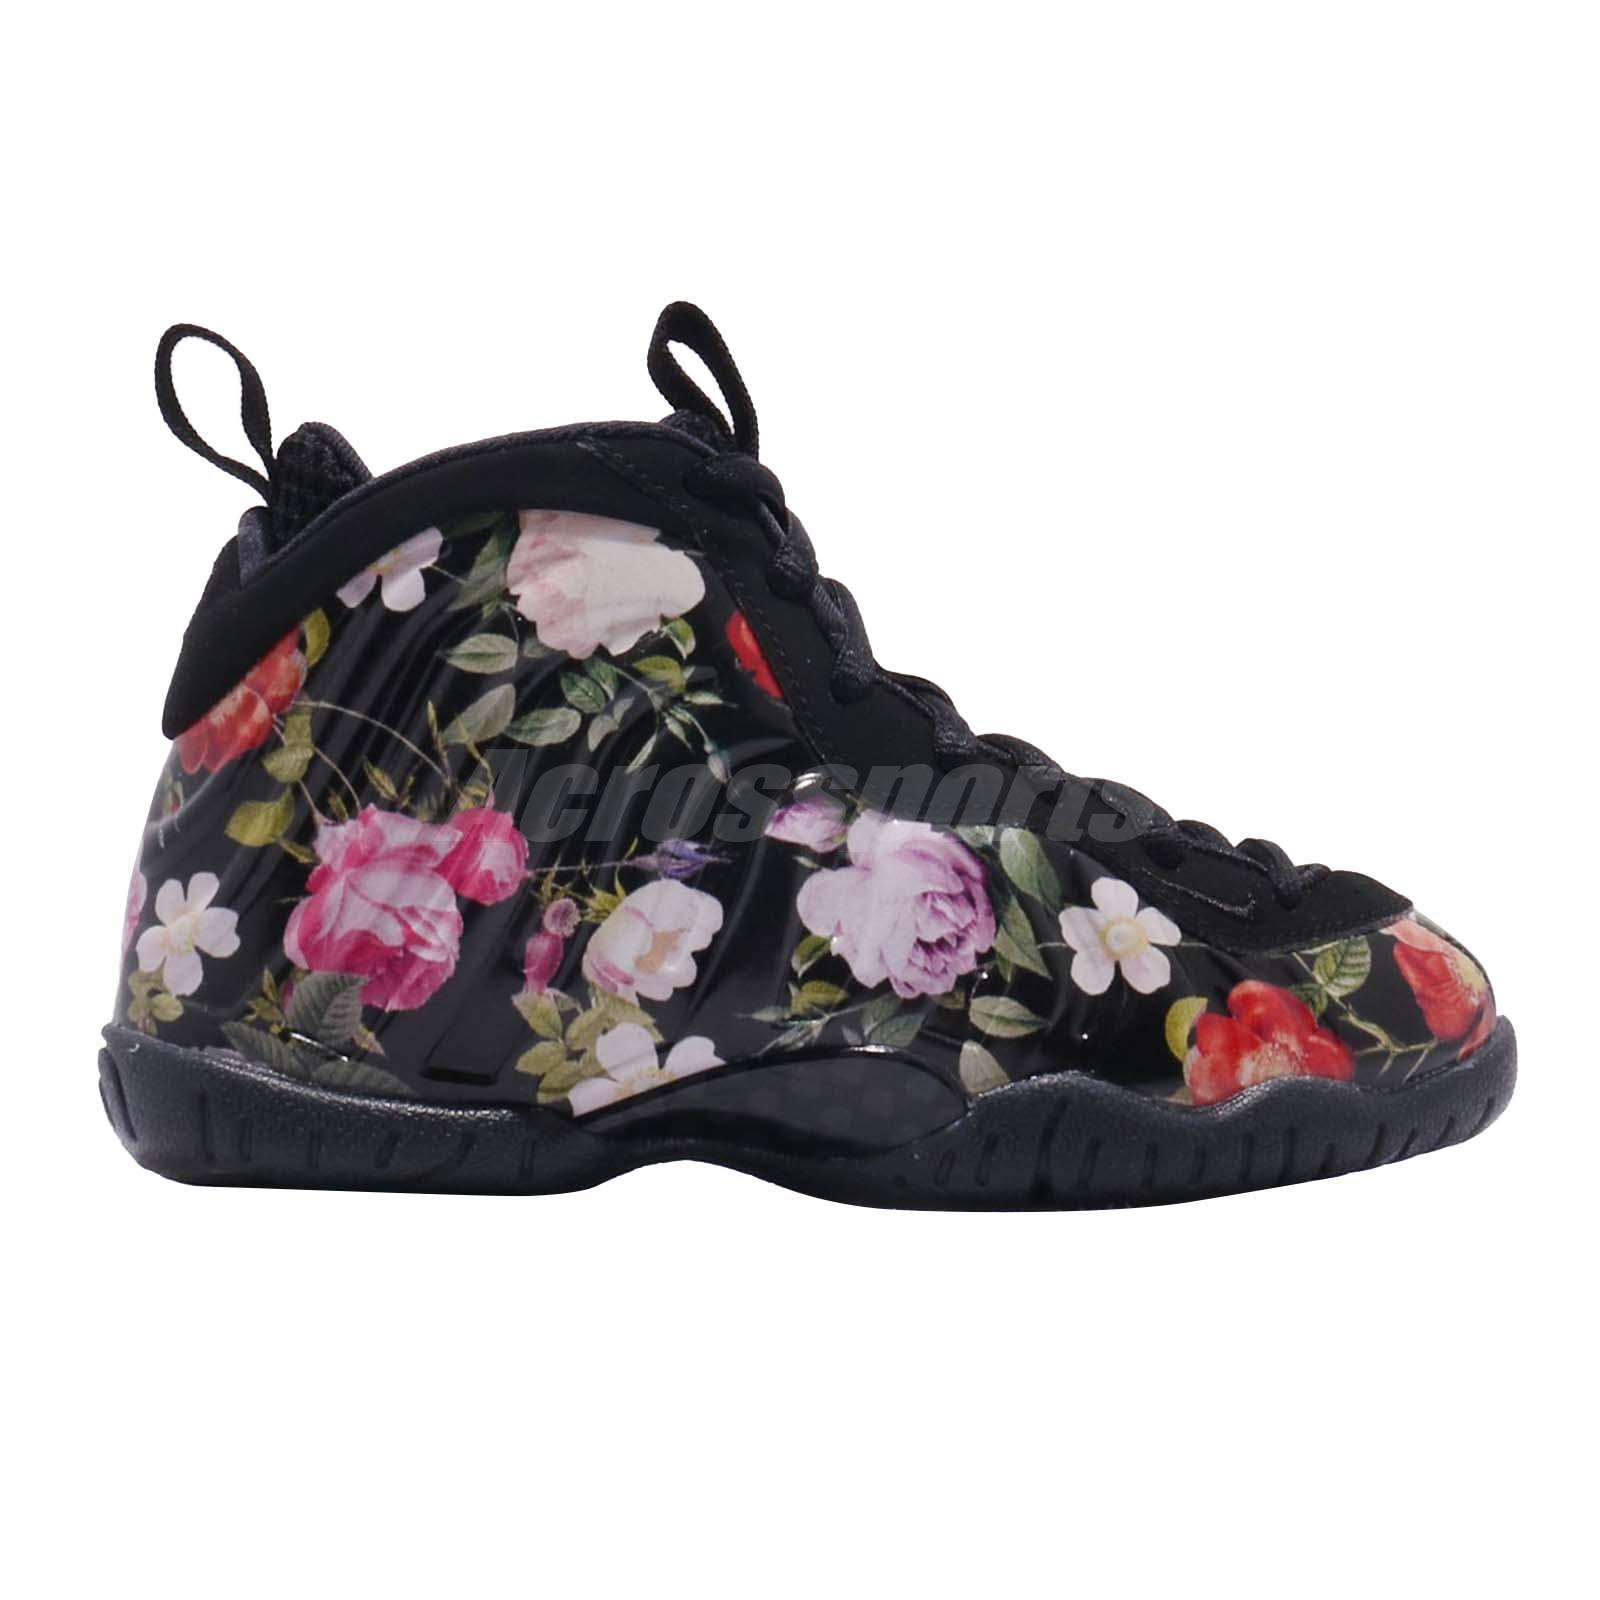 93a4781694042b Nike Little Posite One Prm PS Foamposite Floral Kid Preschool Shoes ...